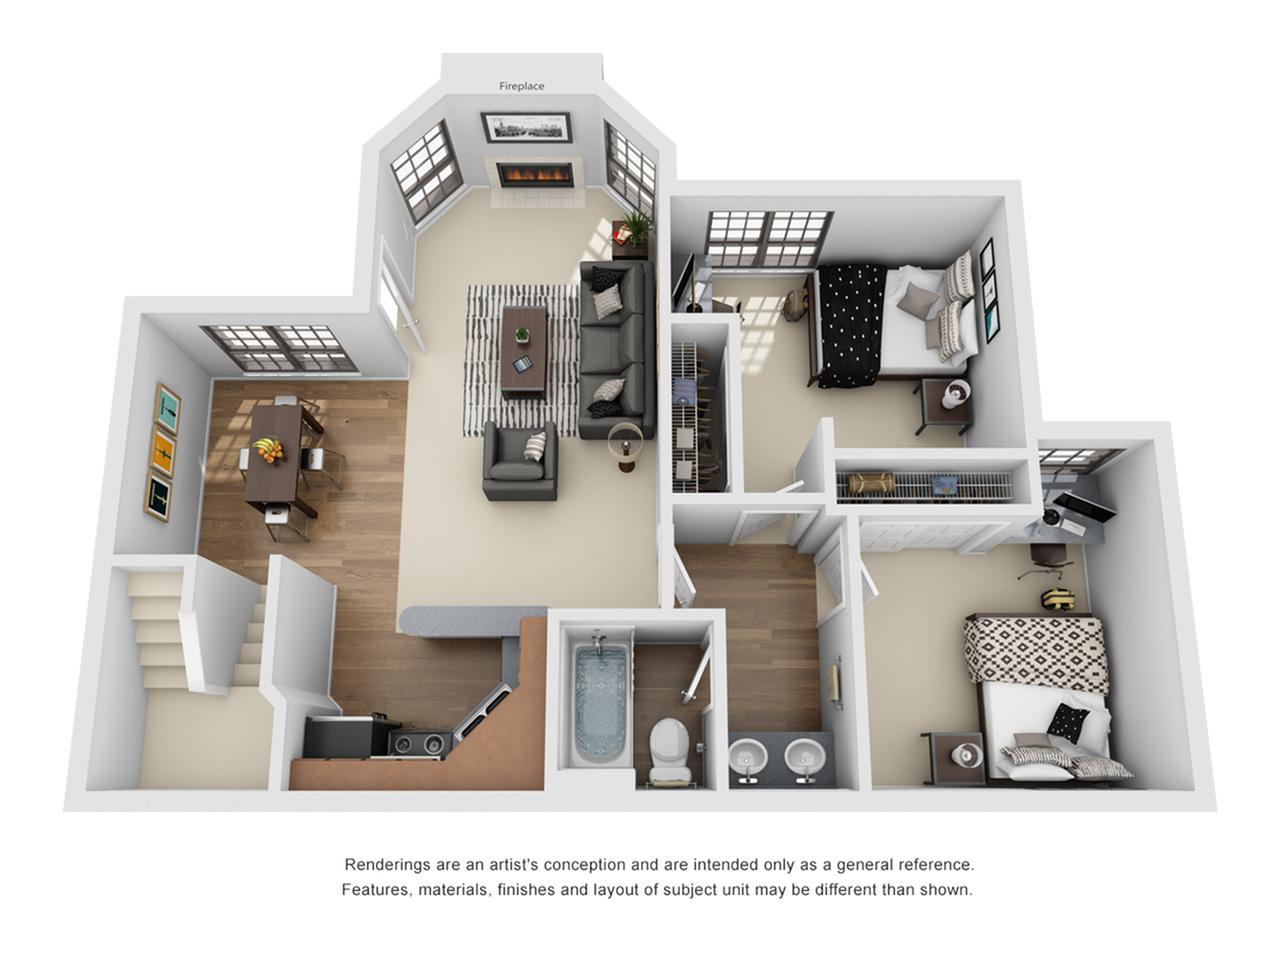 4 Bedroom Apartments In Auburn AL | The Hub at Auburn